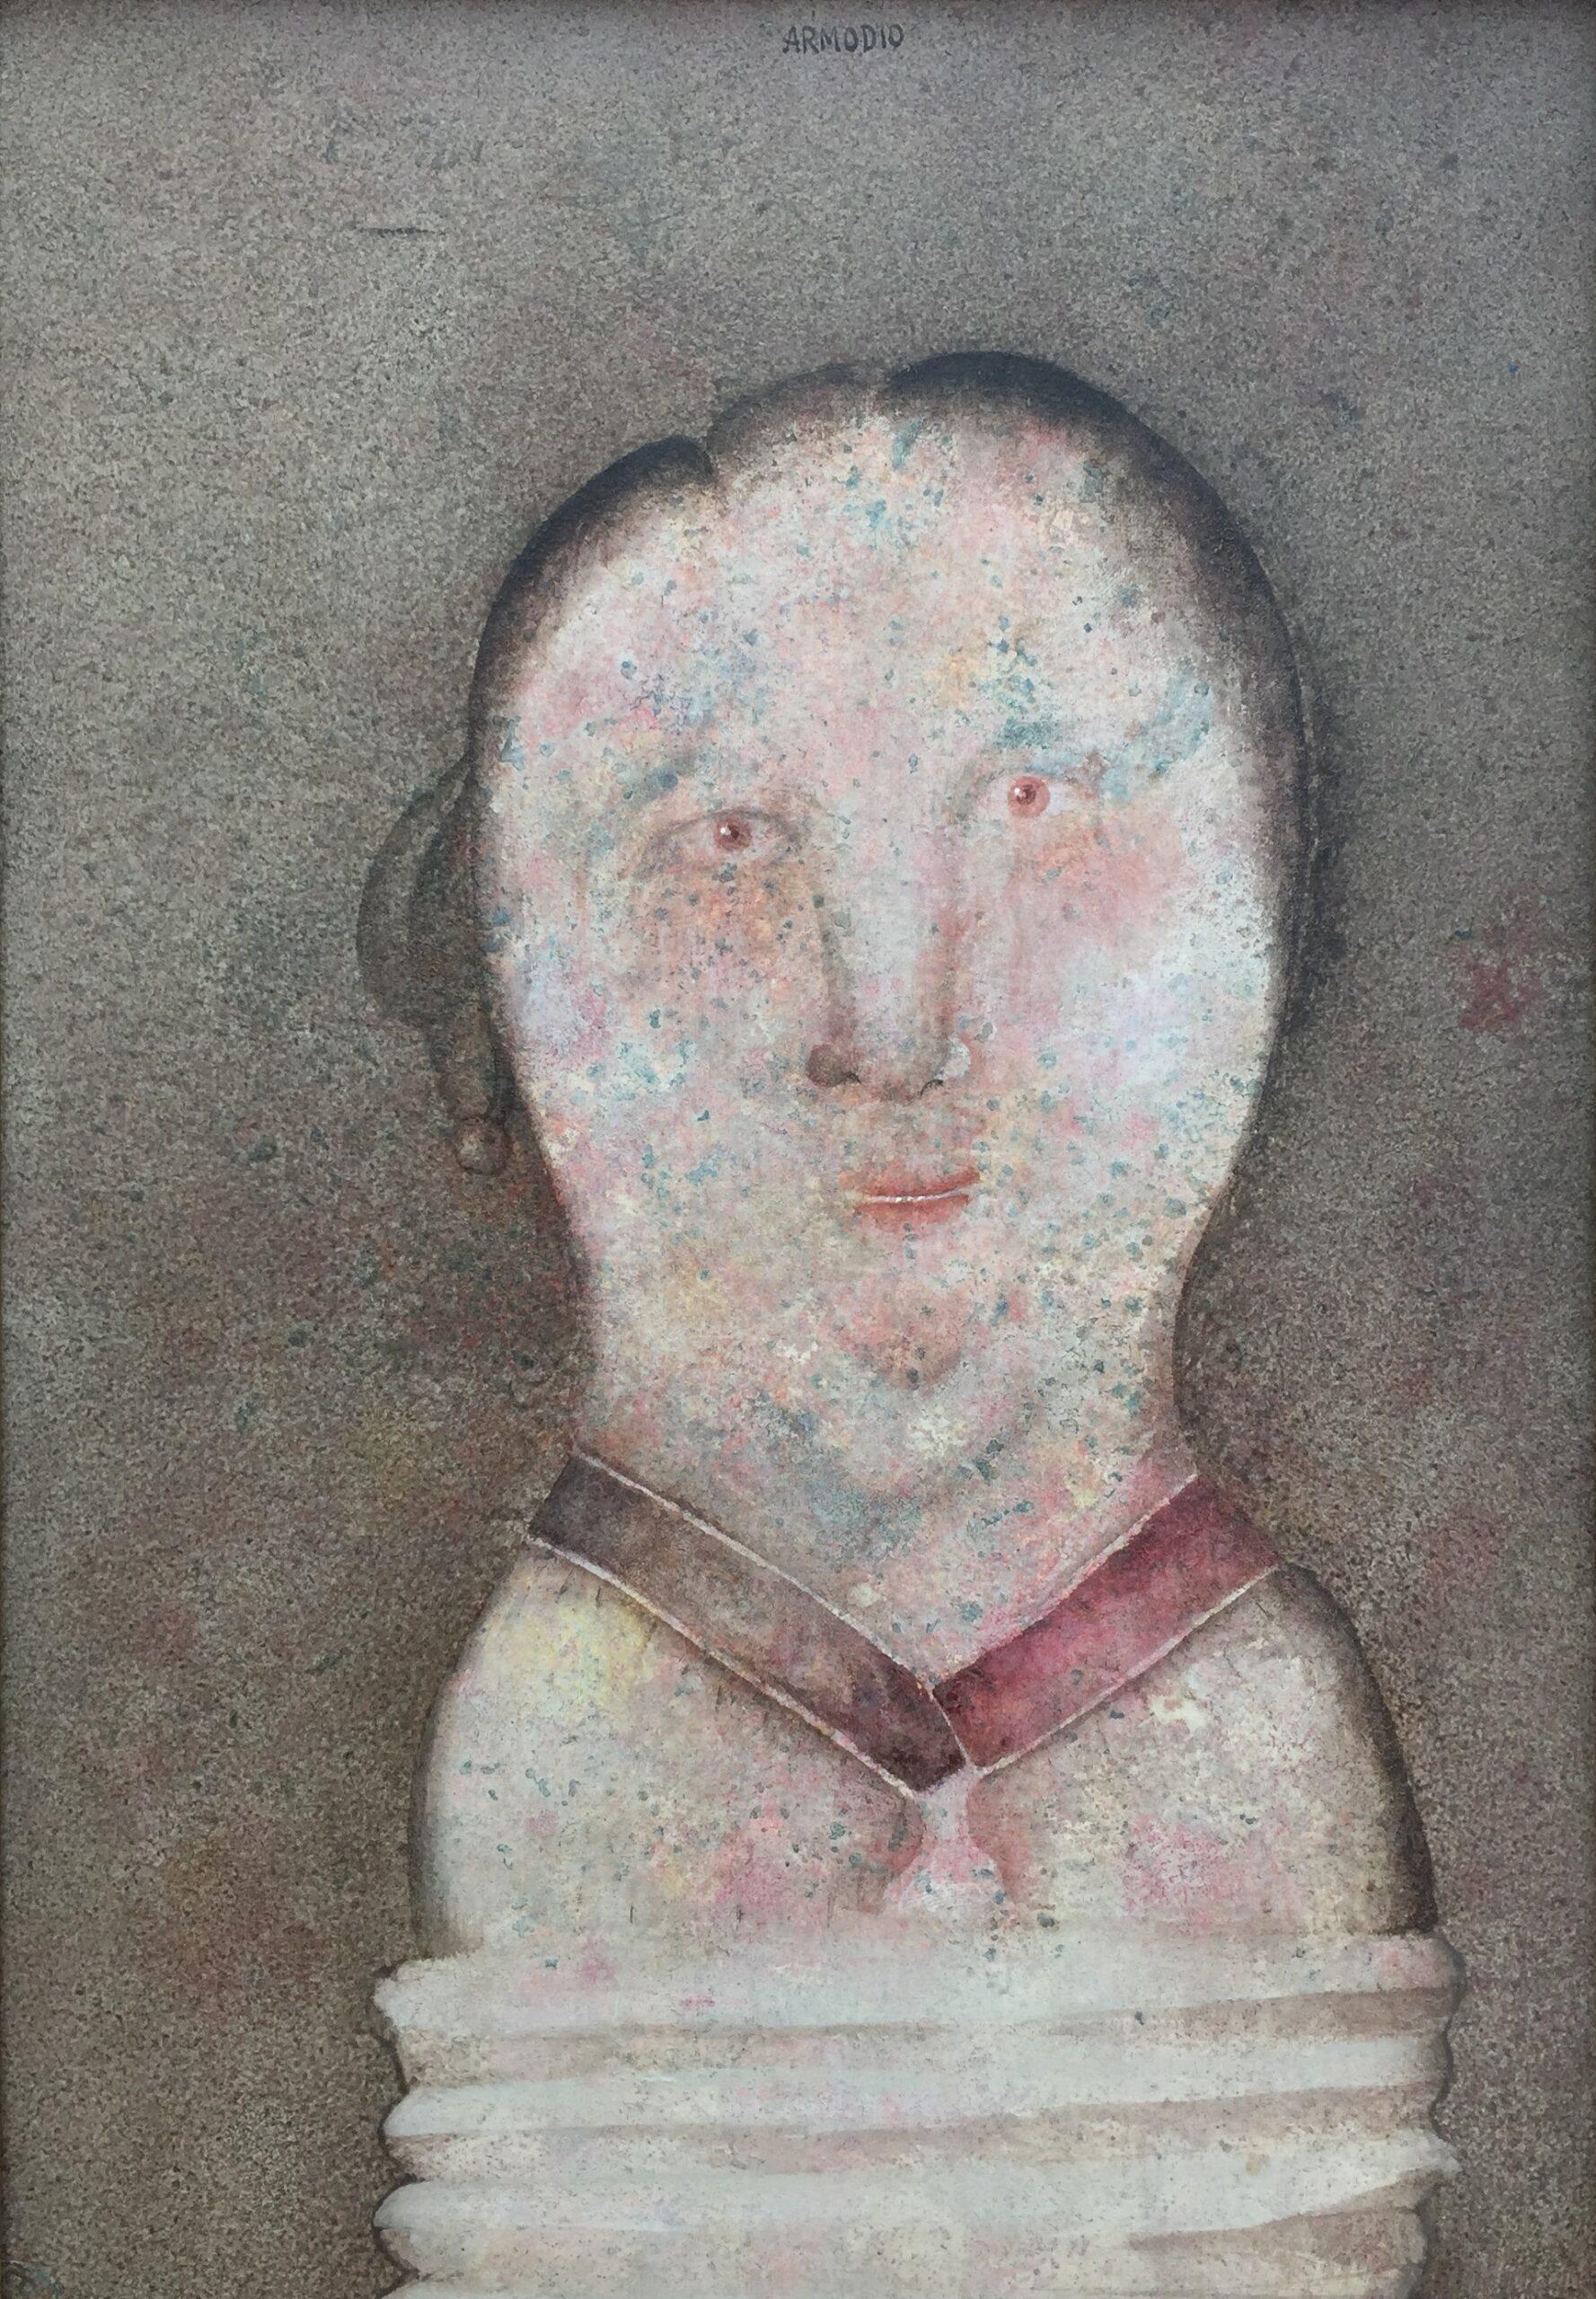 Armodio of Vilmore Schernardi